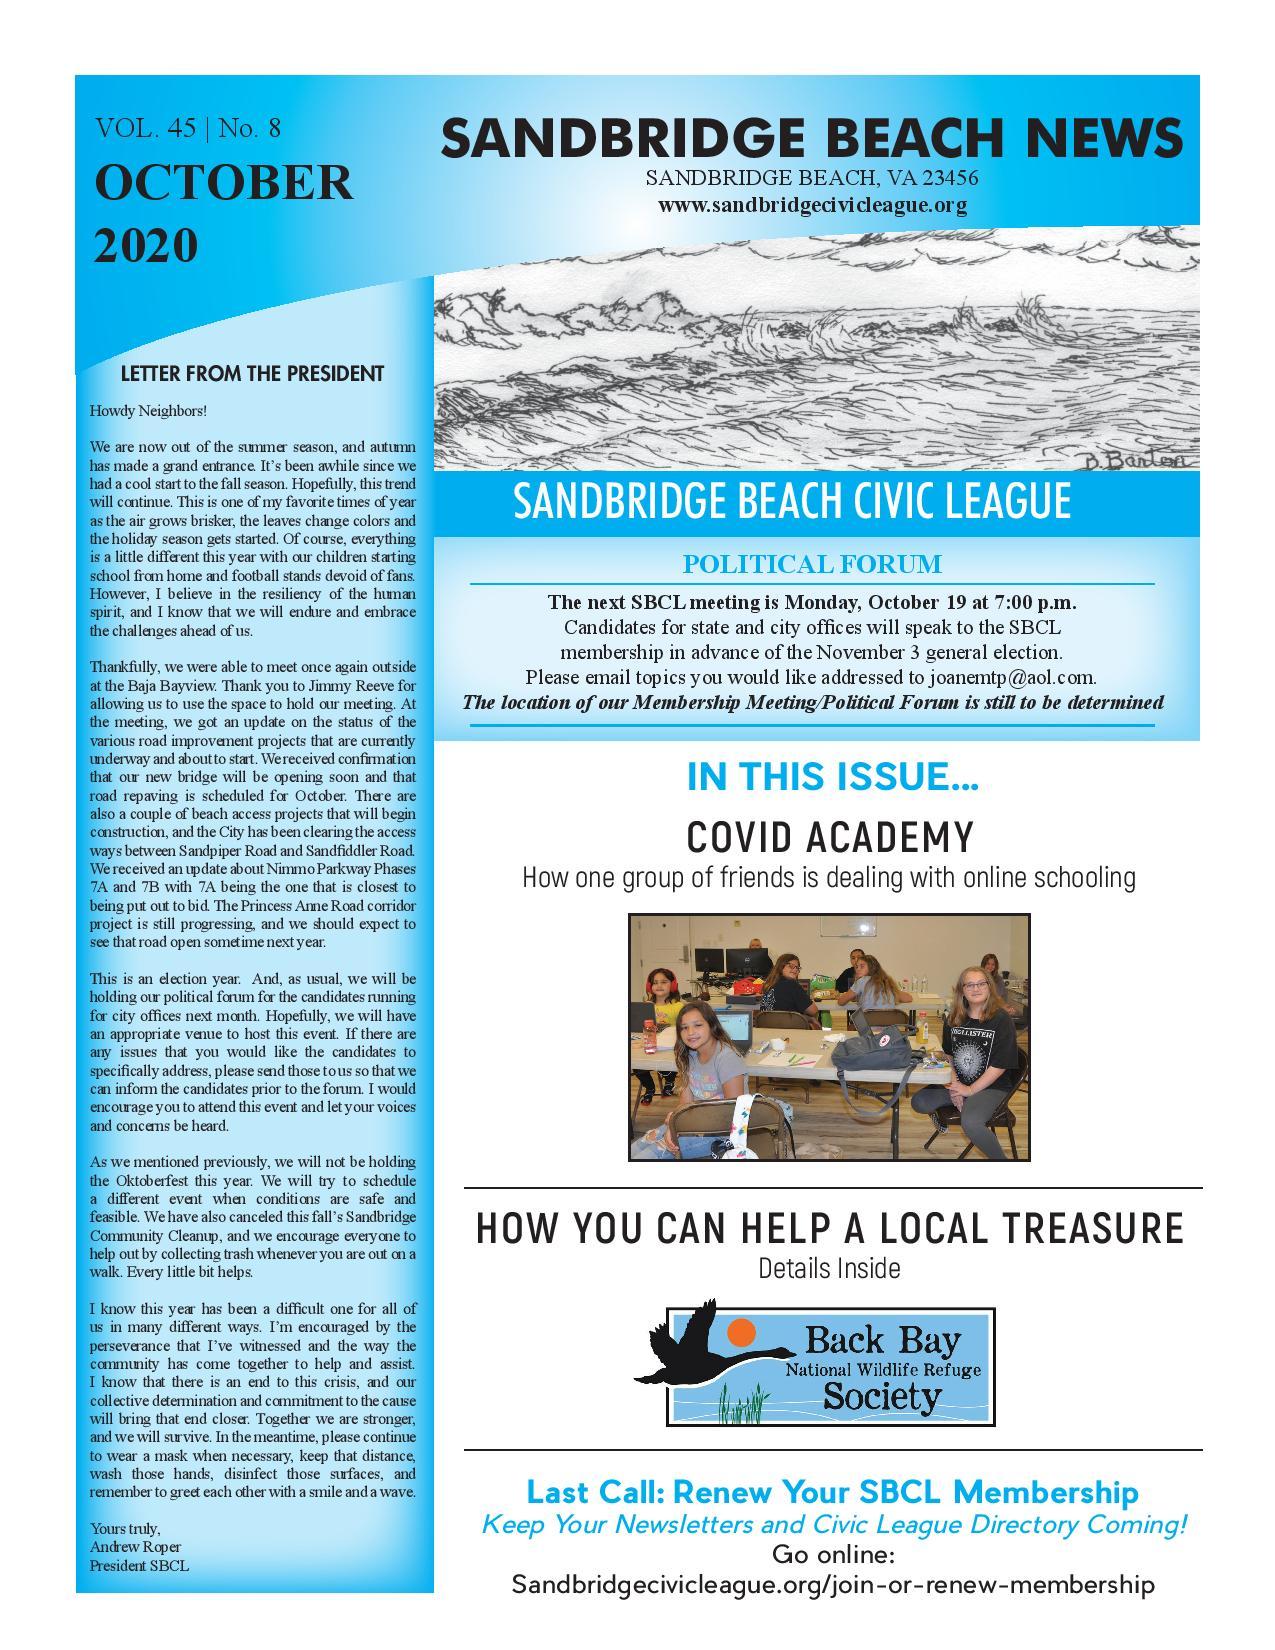 SBCL Newsletter Oct 2020